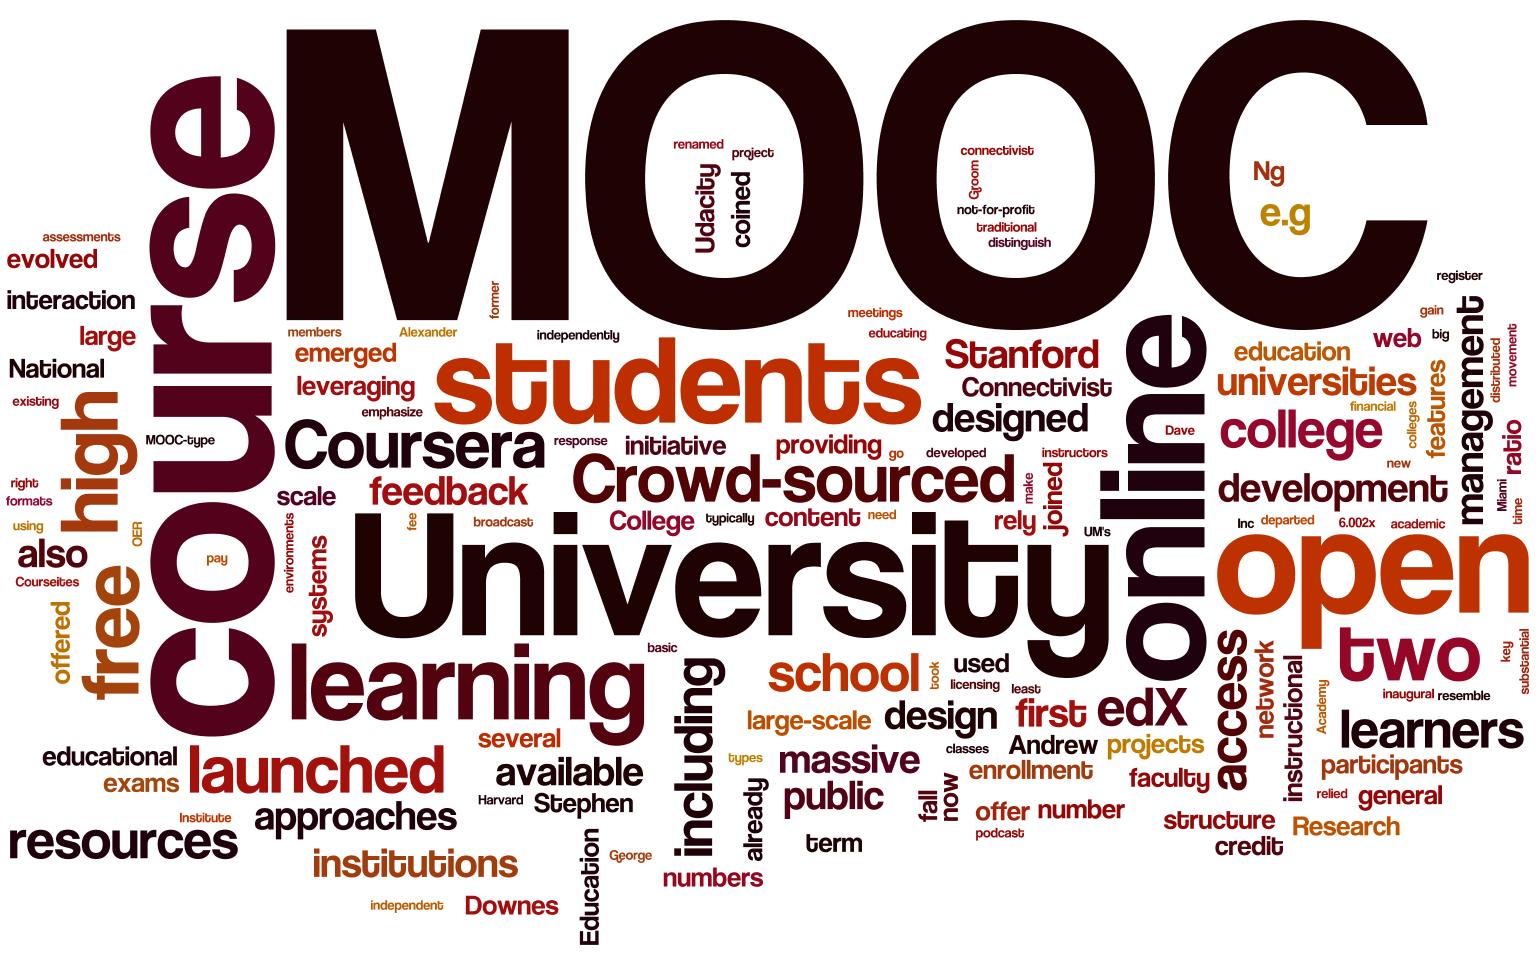 Qu'est-ce qu'un MOOC?